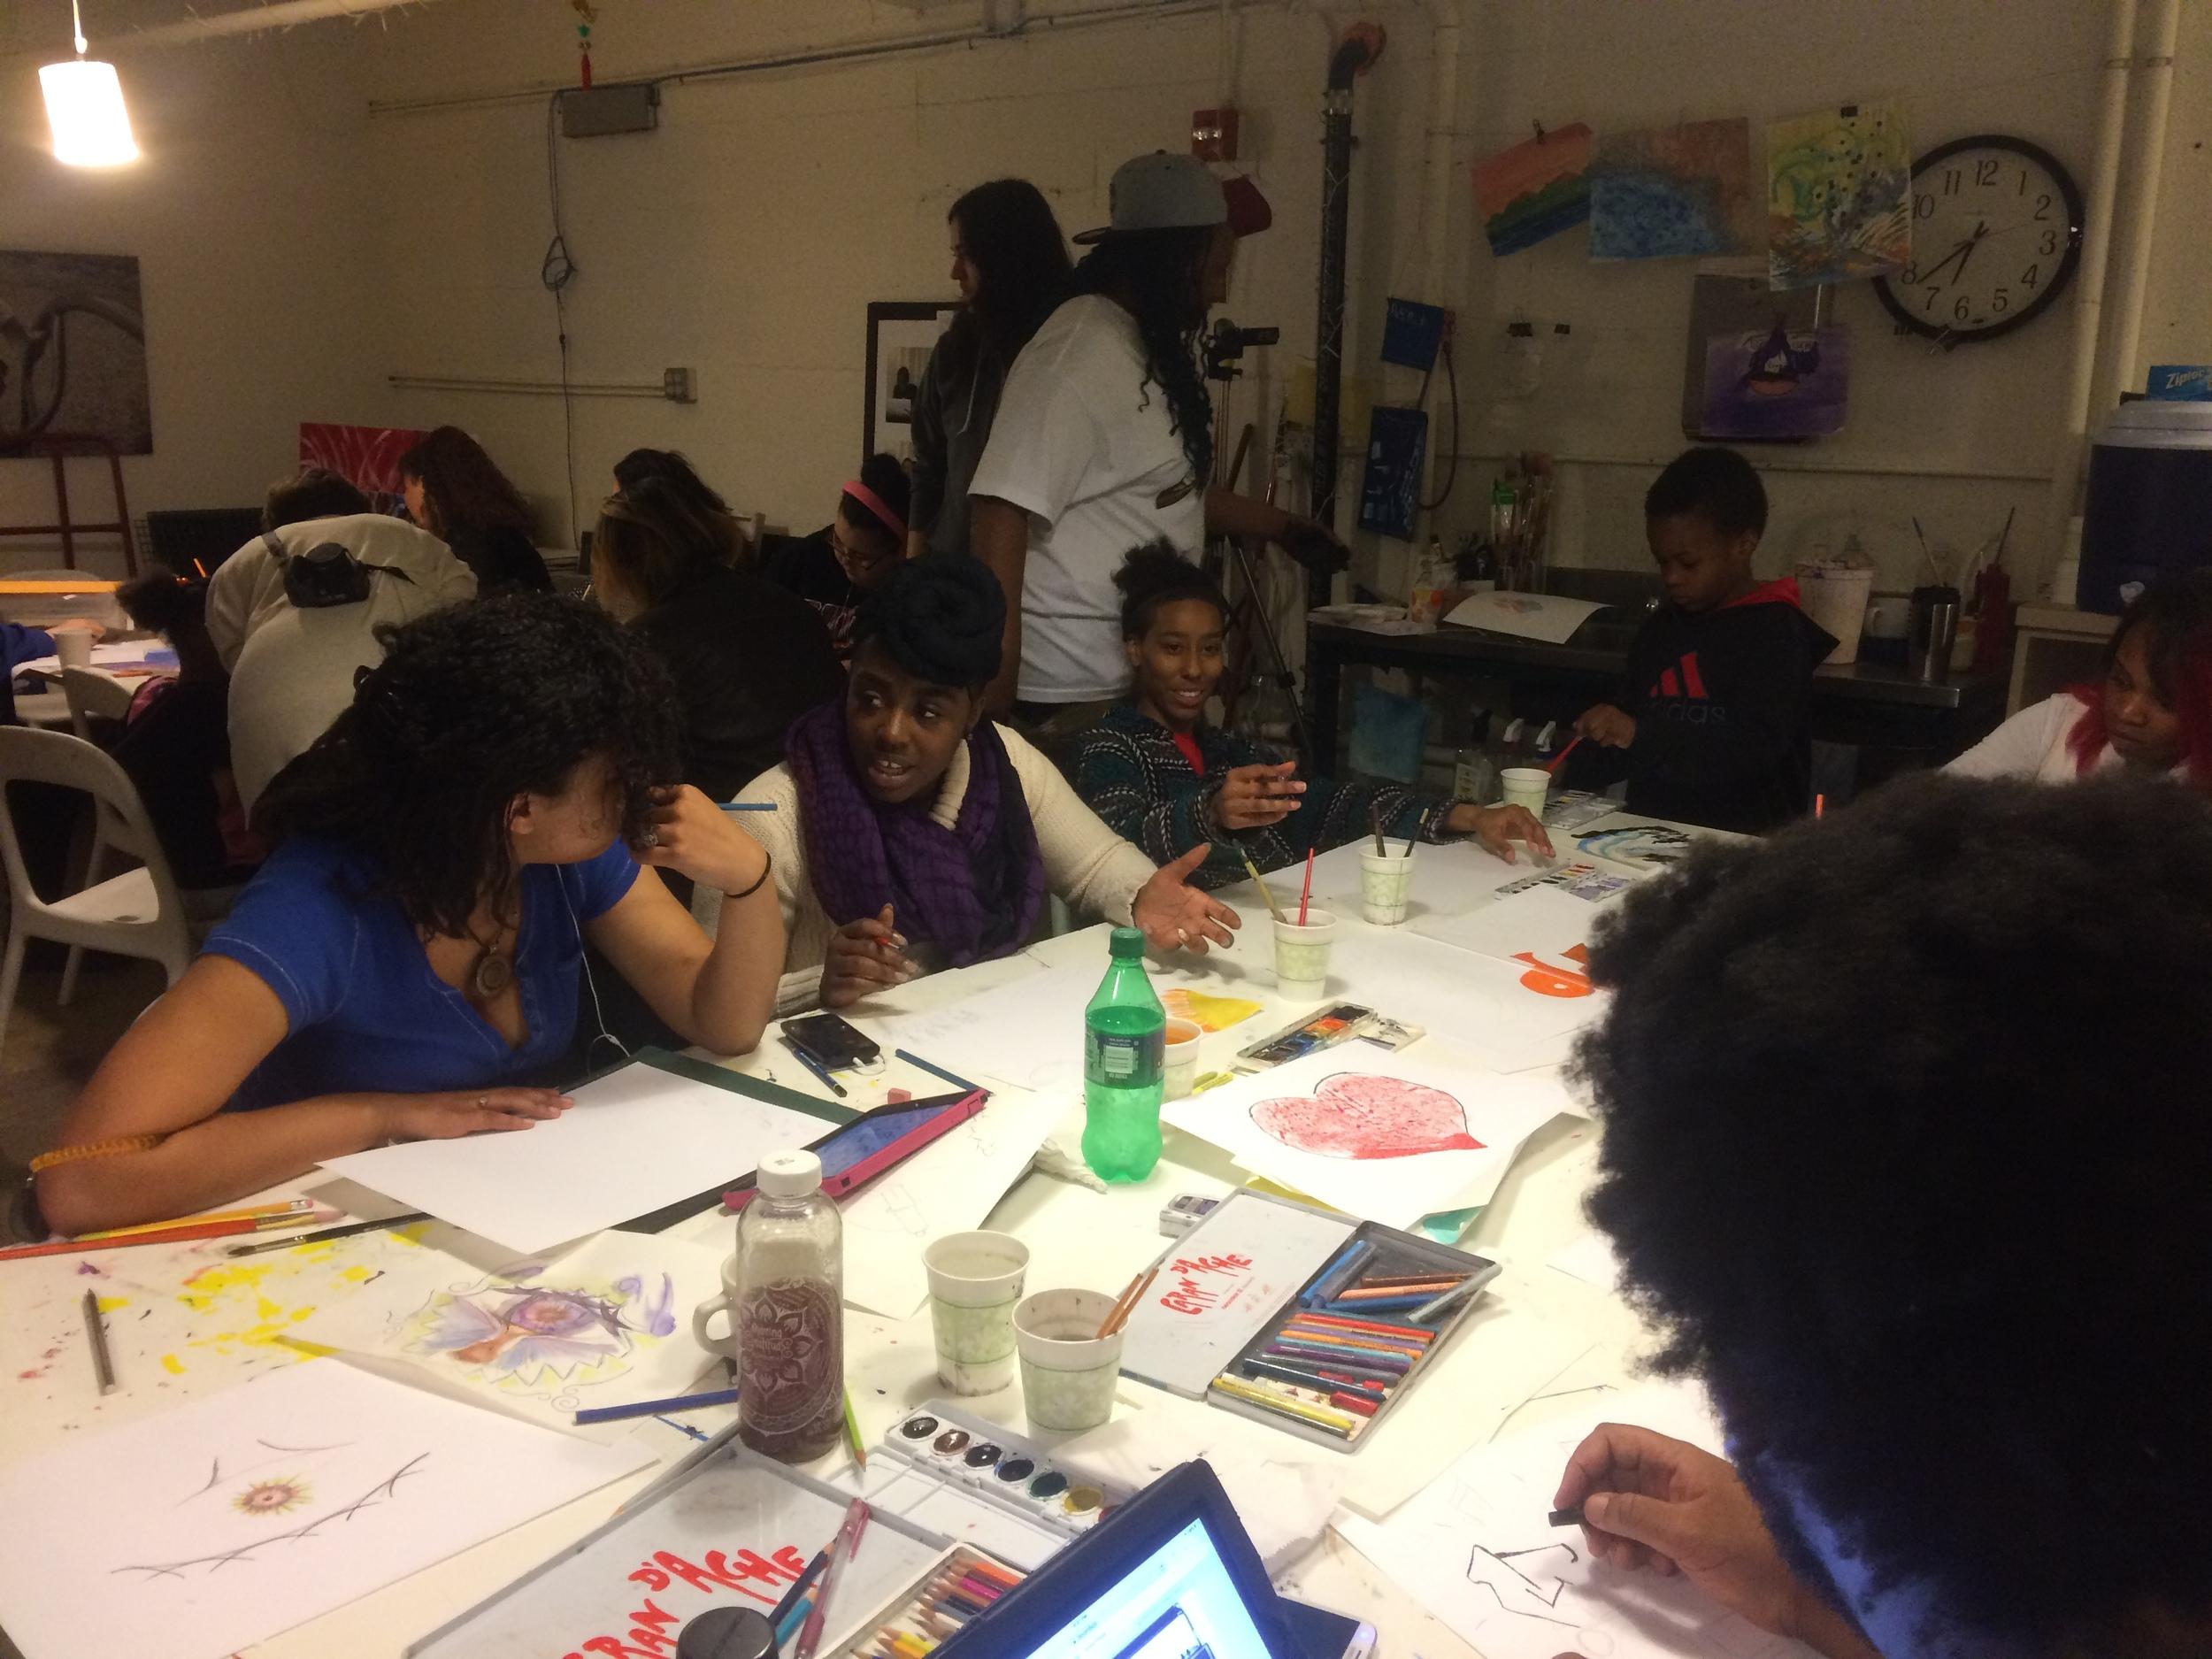 Second watercolor workshop at Kulture Klub!